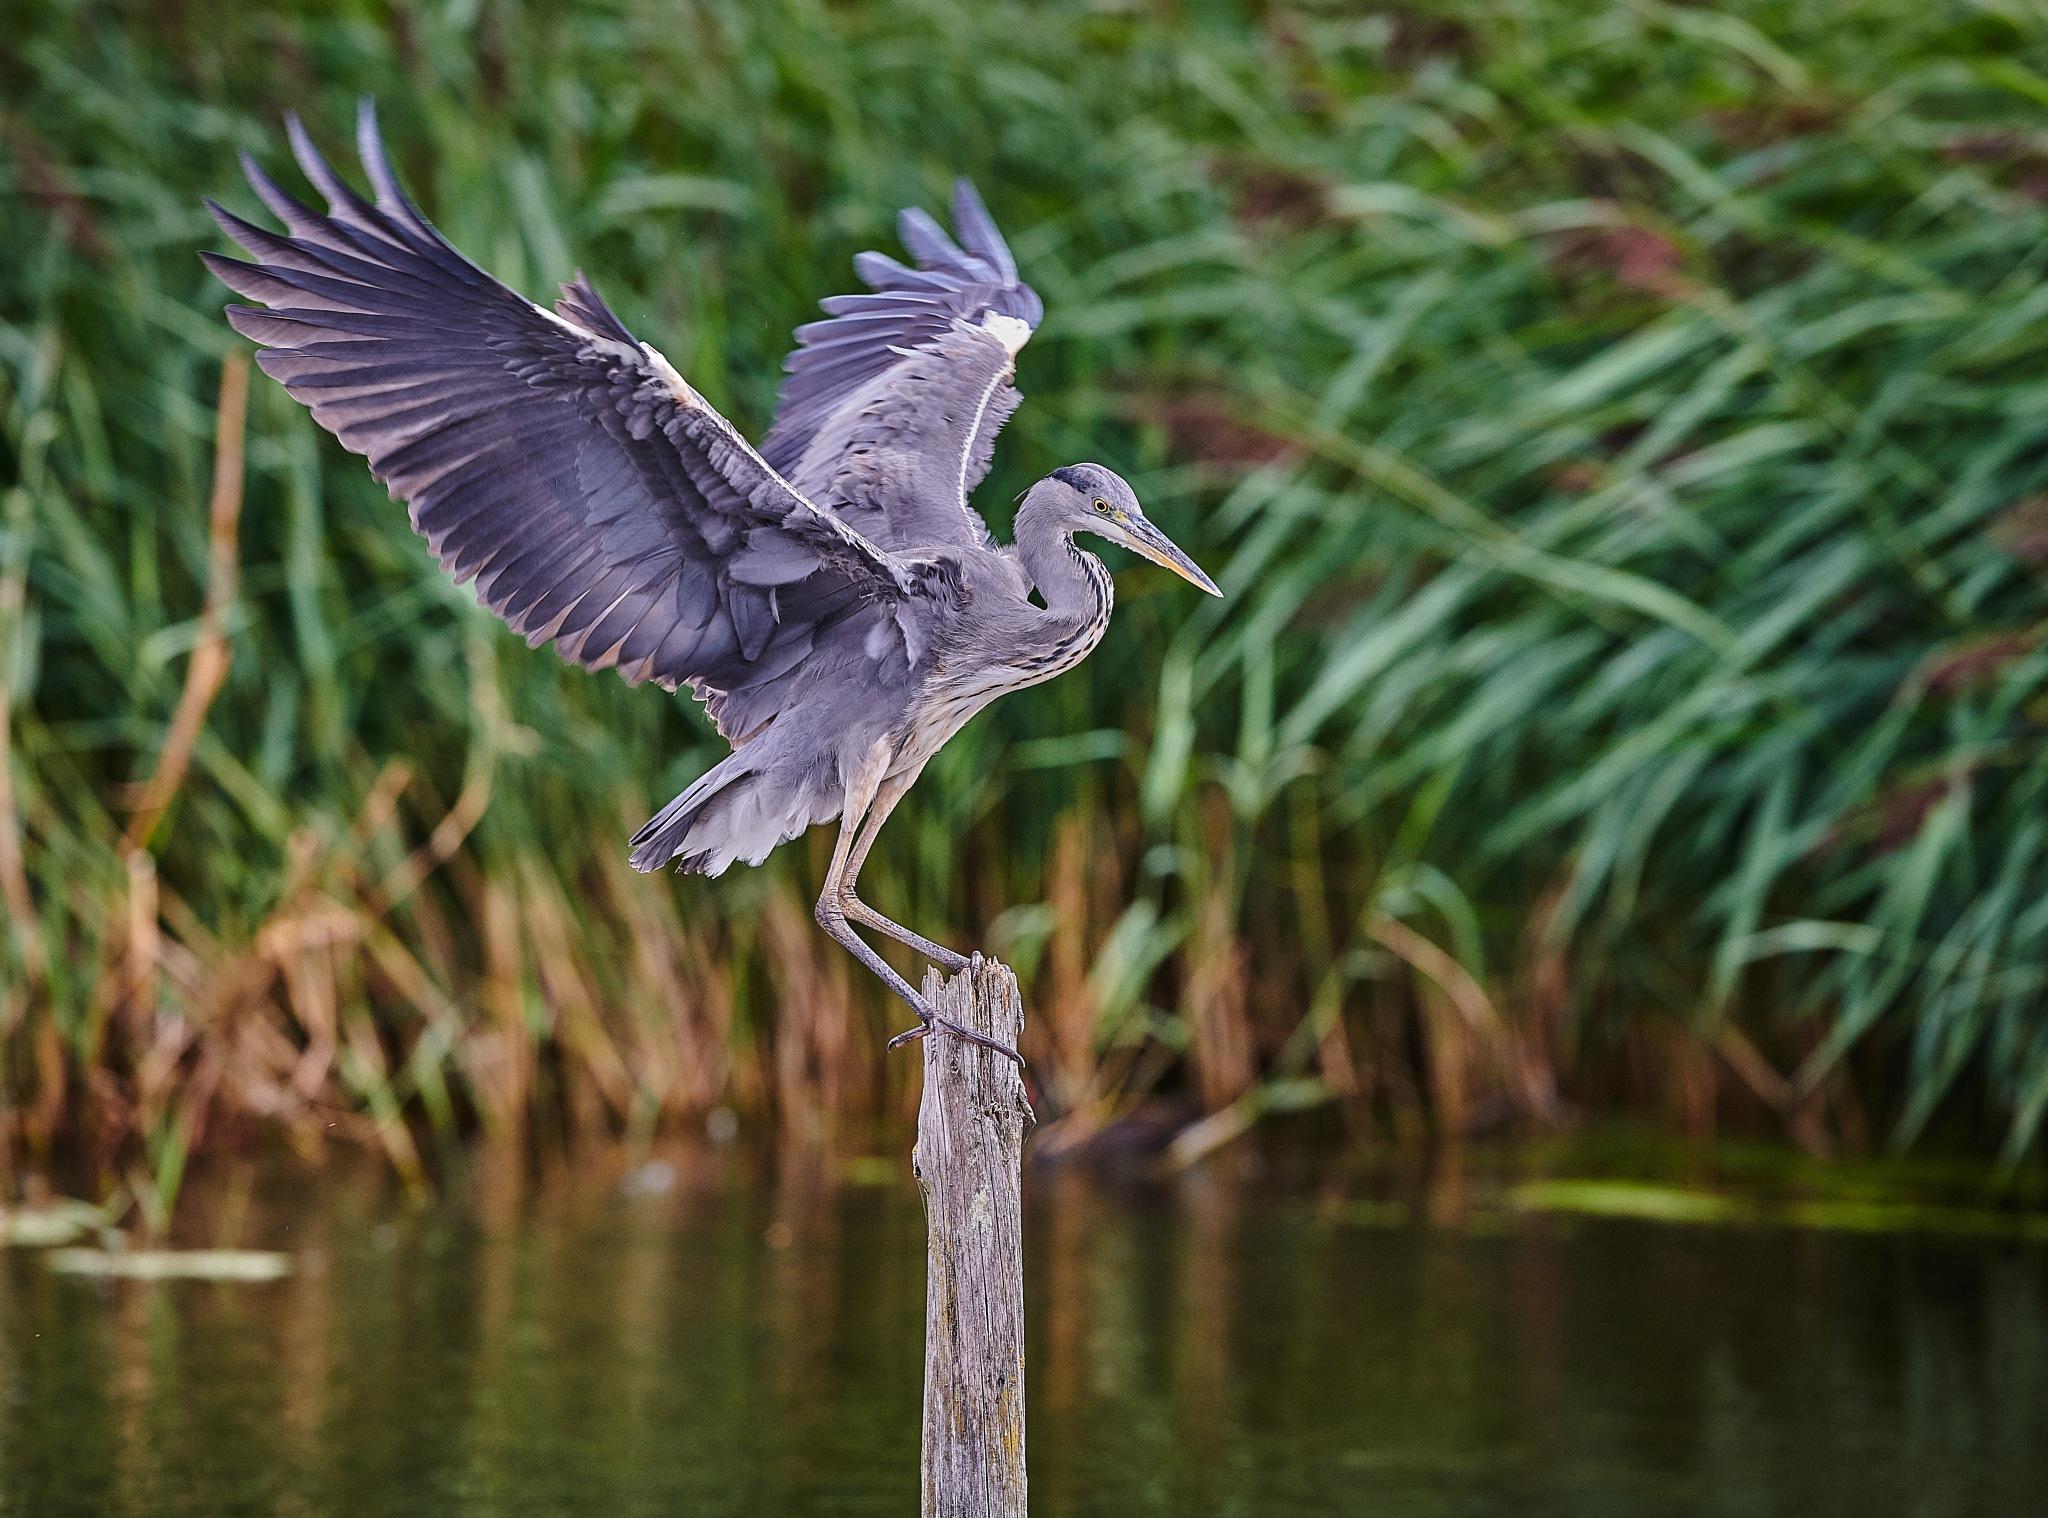 Skilful Grey Heron landing on a pole by Paul Collins